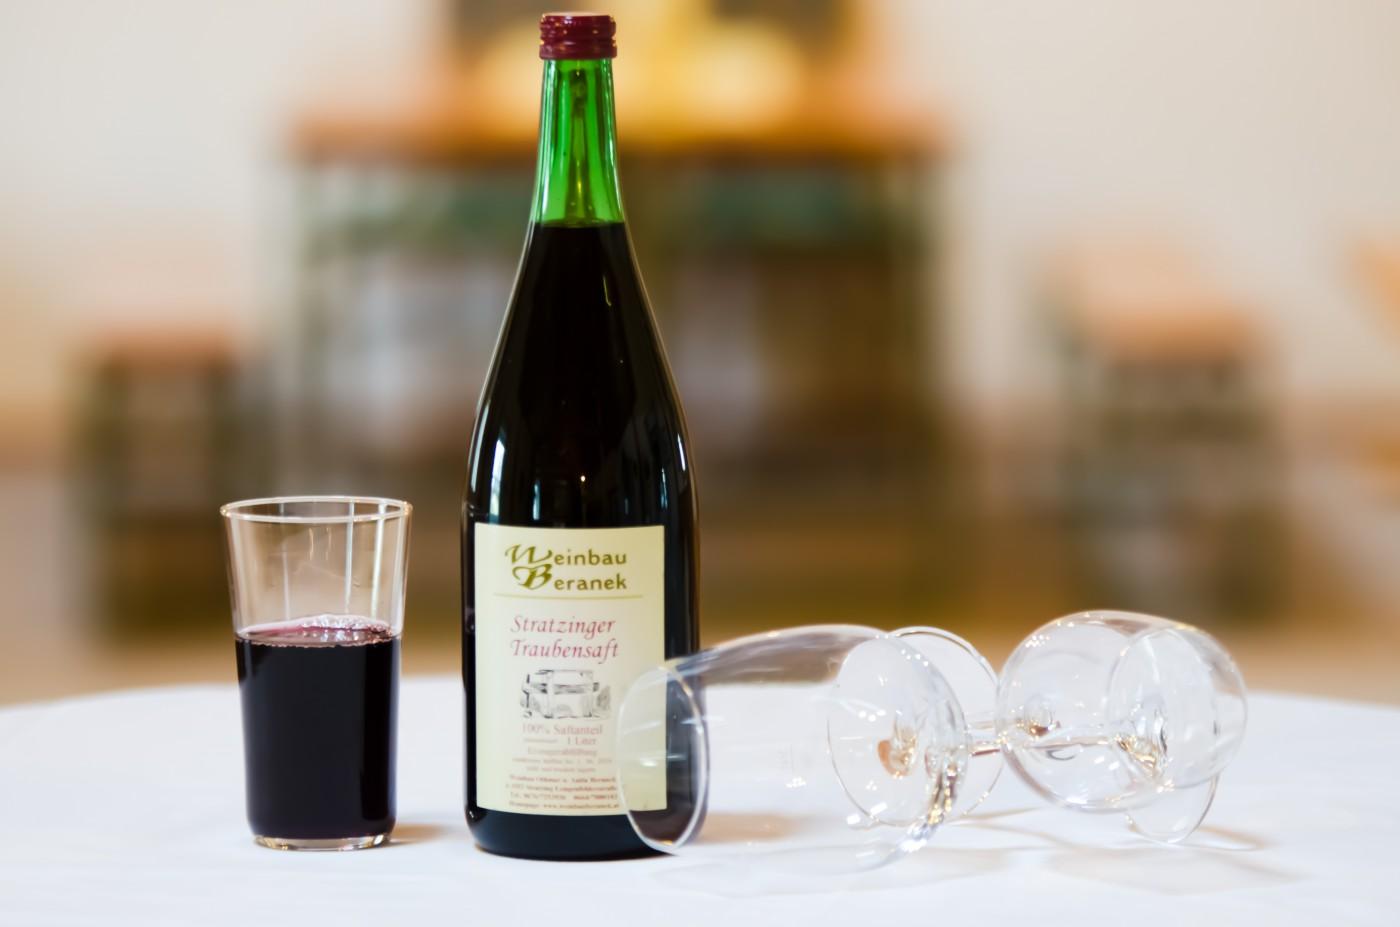 Stratzinger Traubensaft rot - Weinbau Beranek